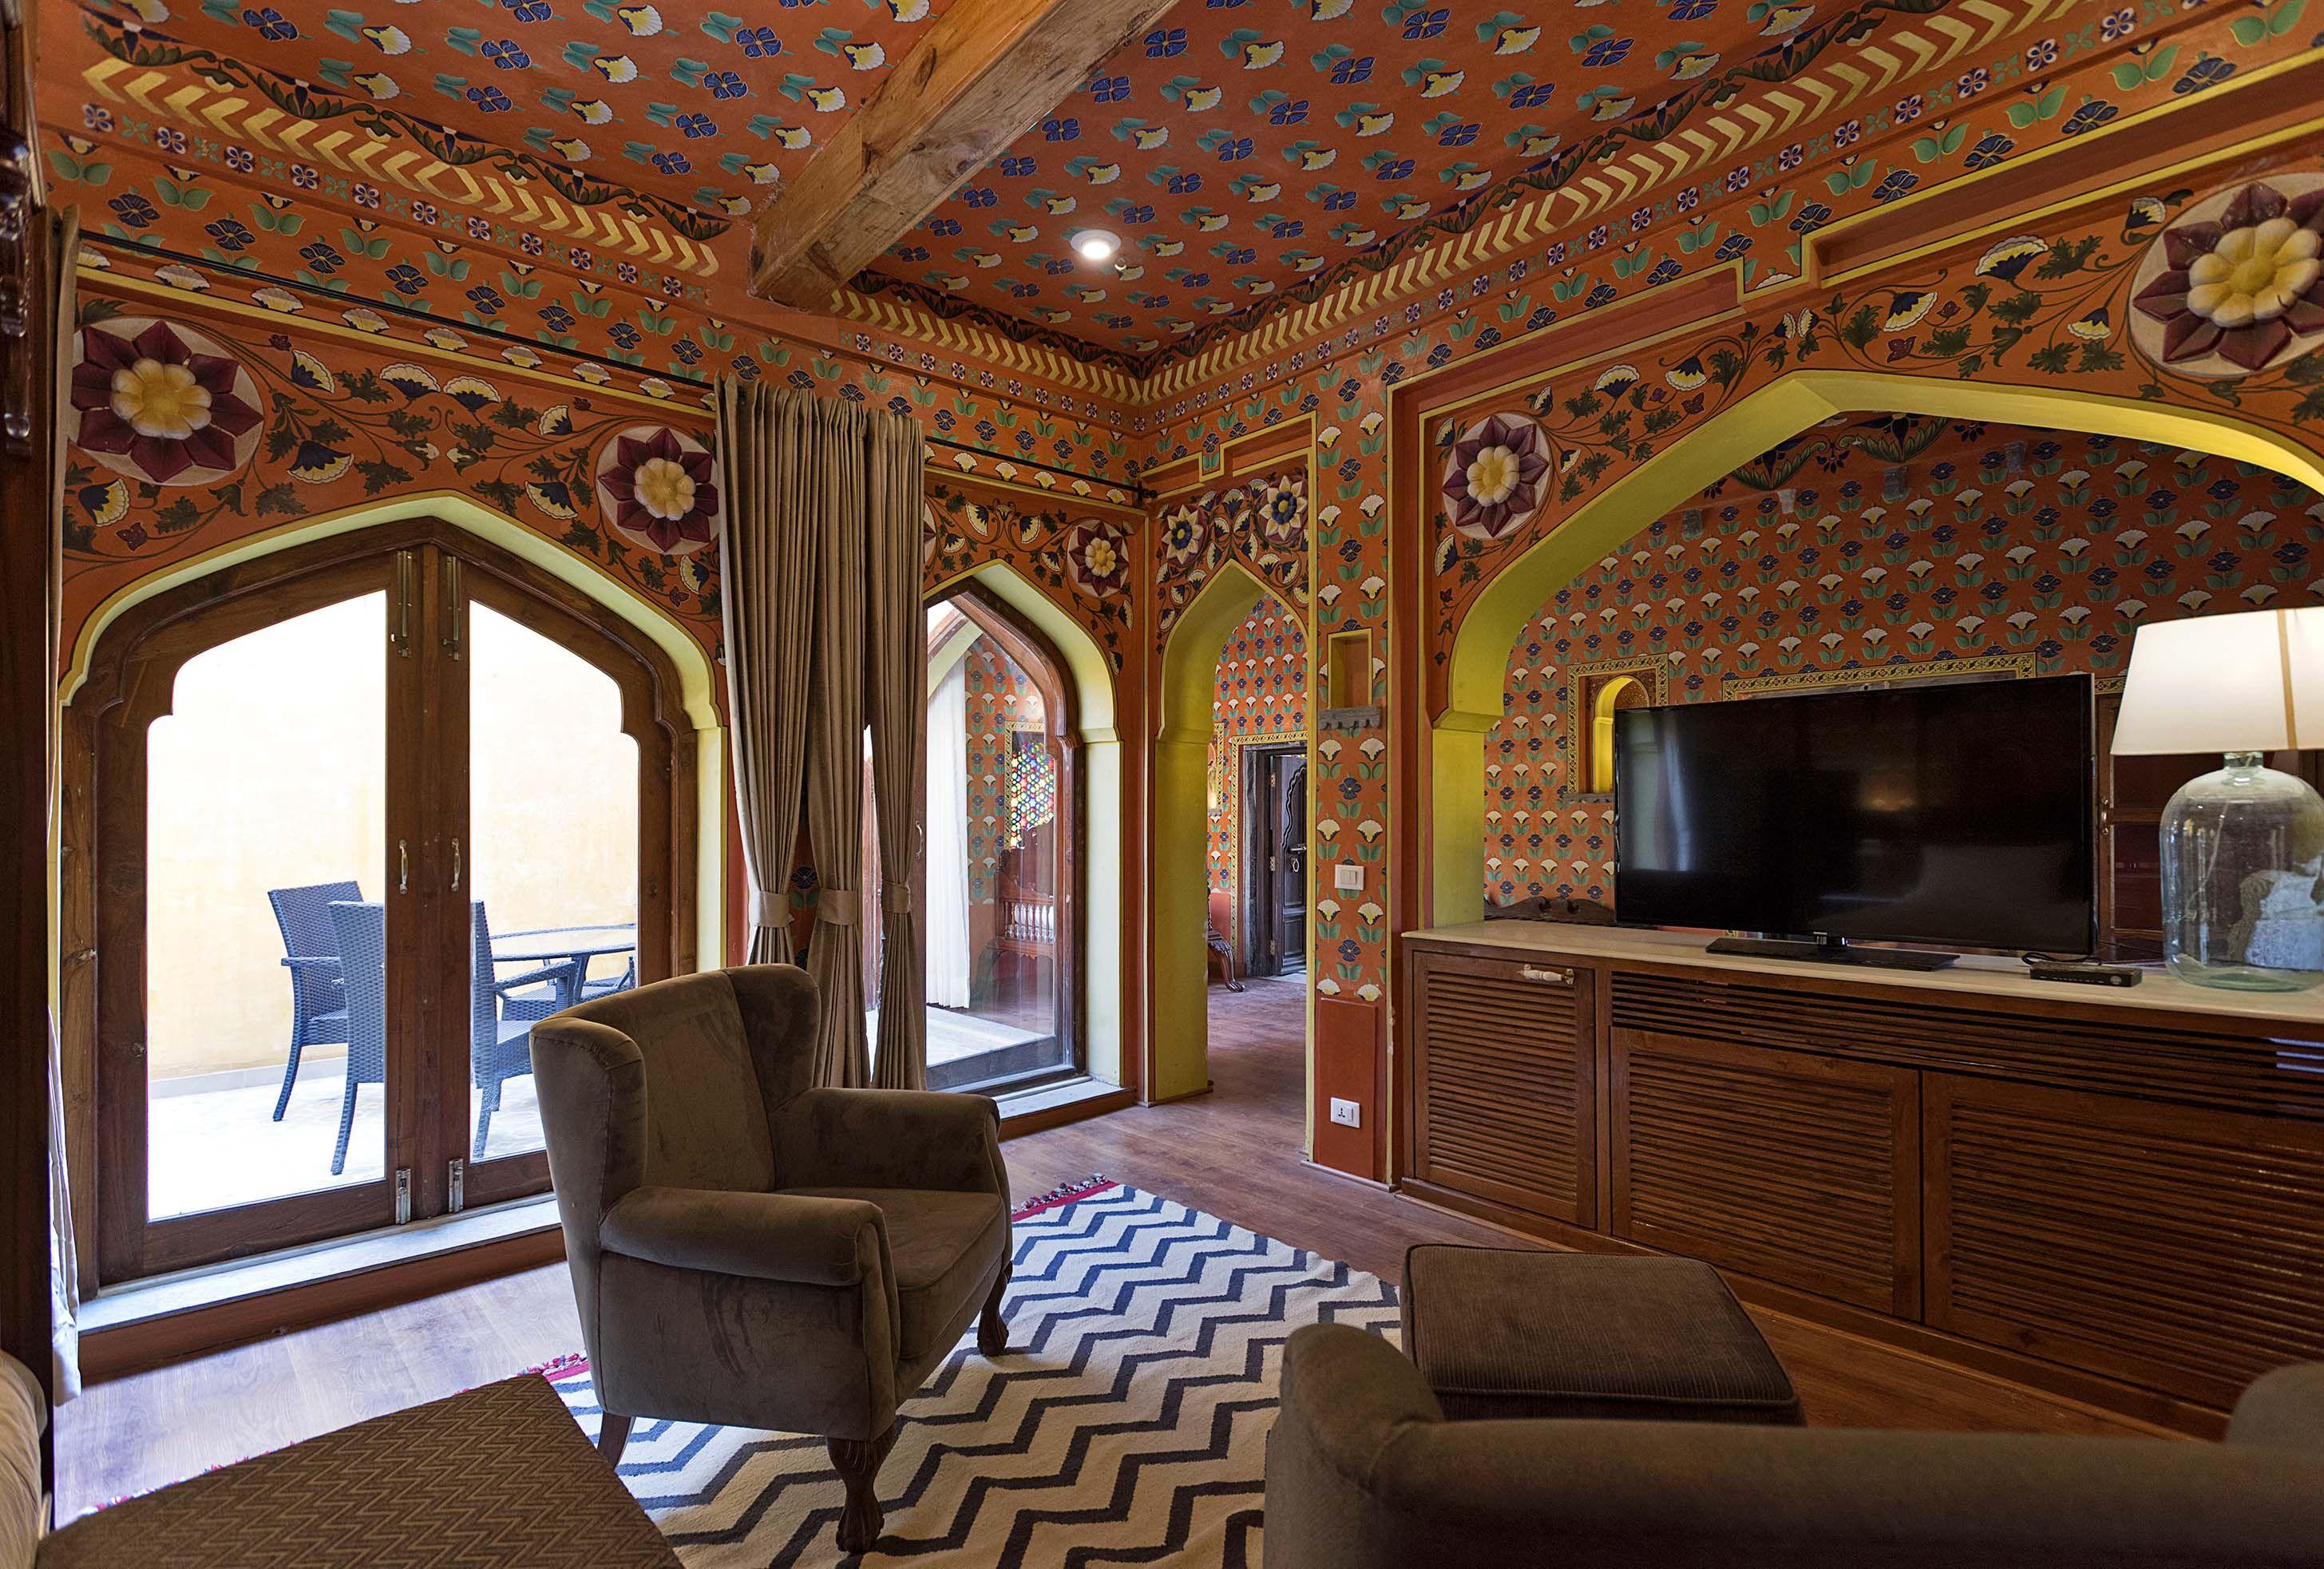 Raaj Tilak Suite at Gogunda Palace, Udaipur Palace hotel